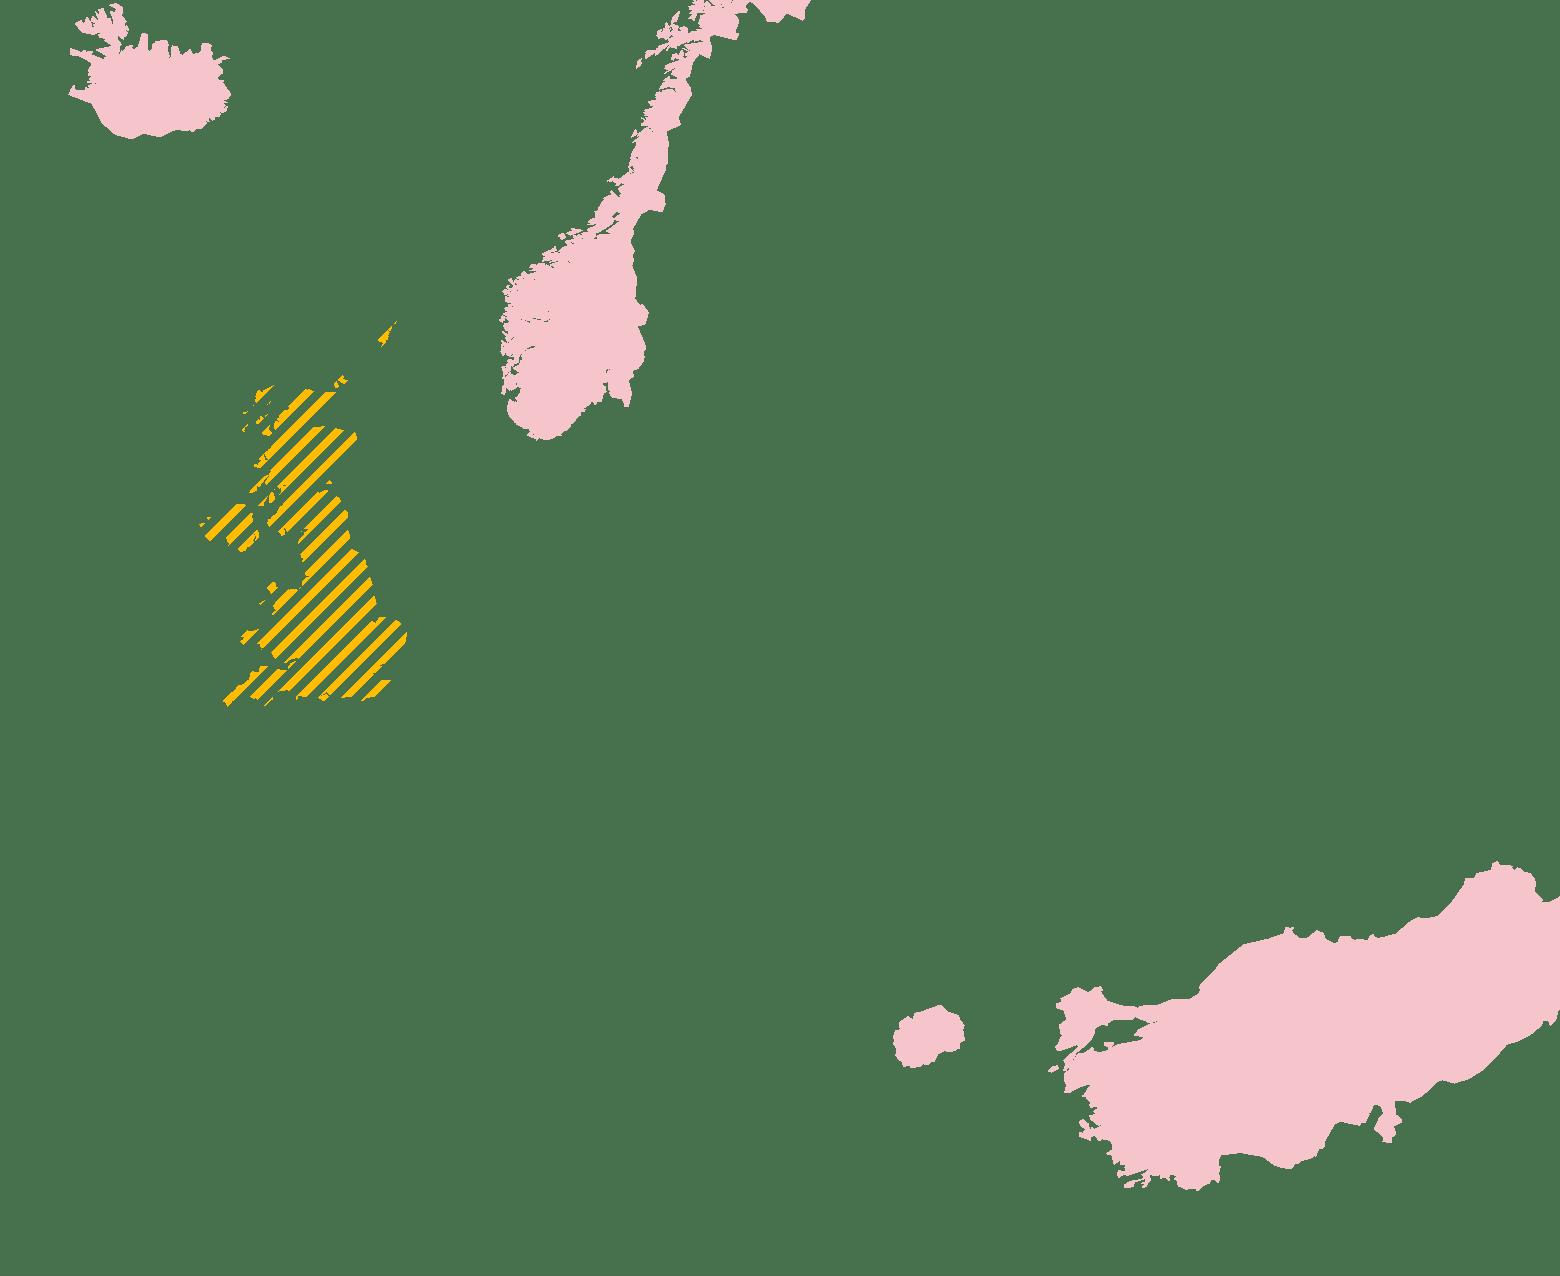 pays Erasmus hors UE et en attente